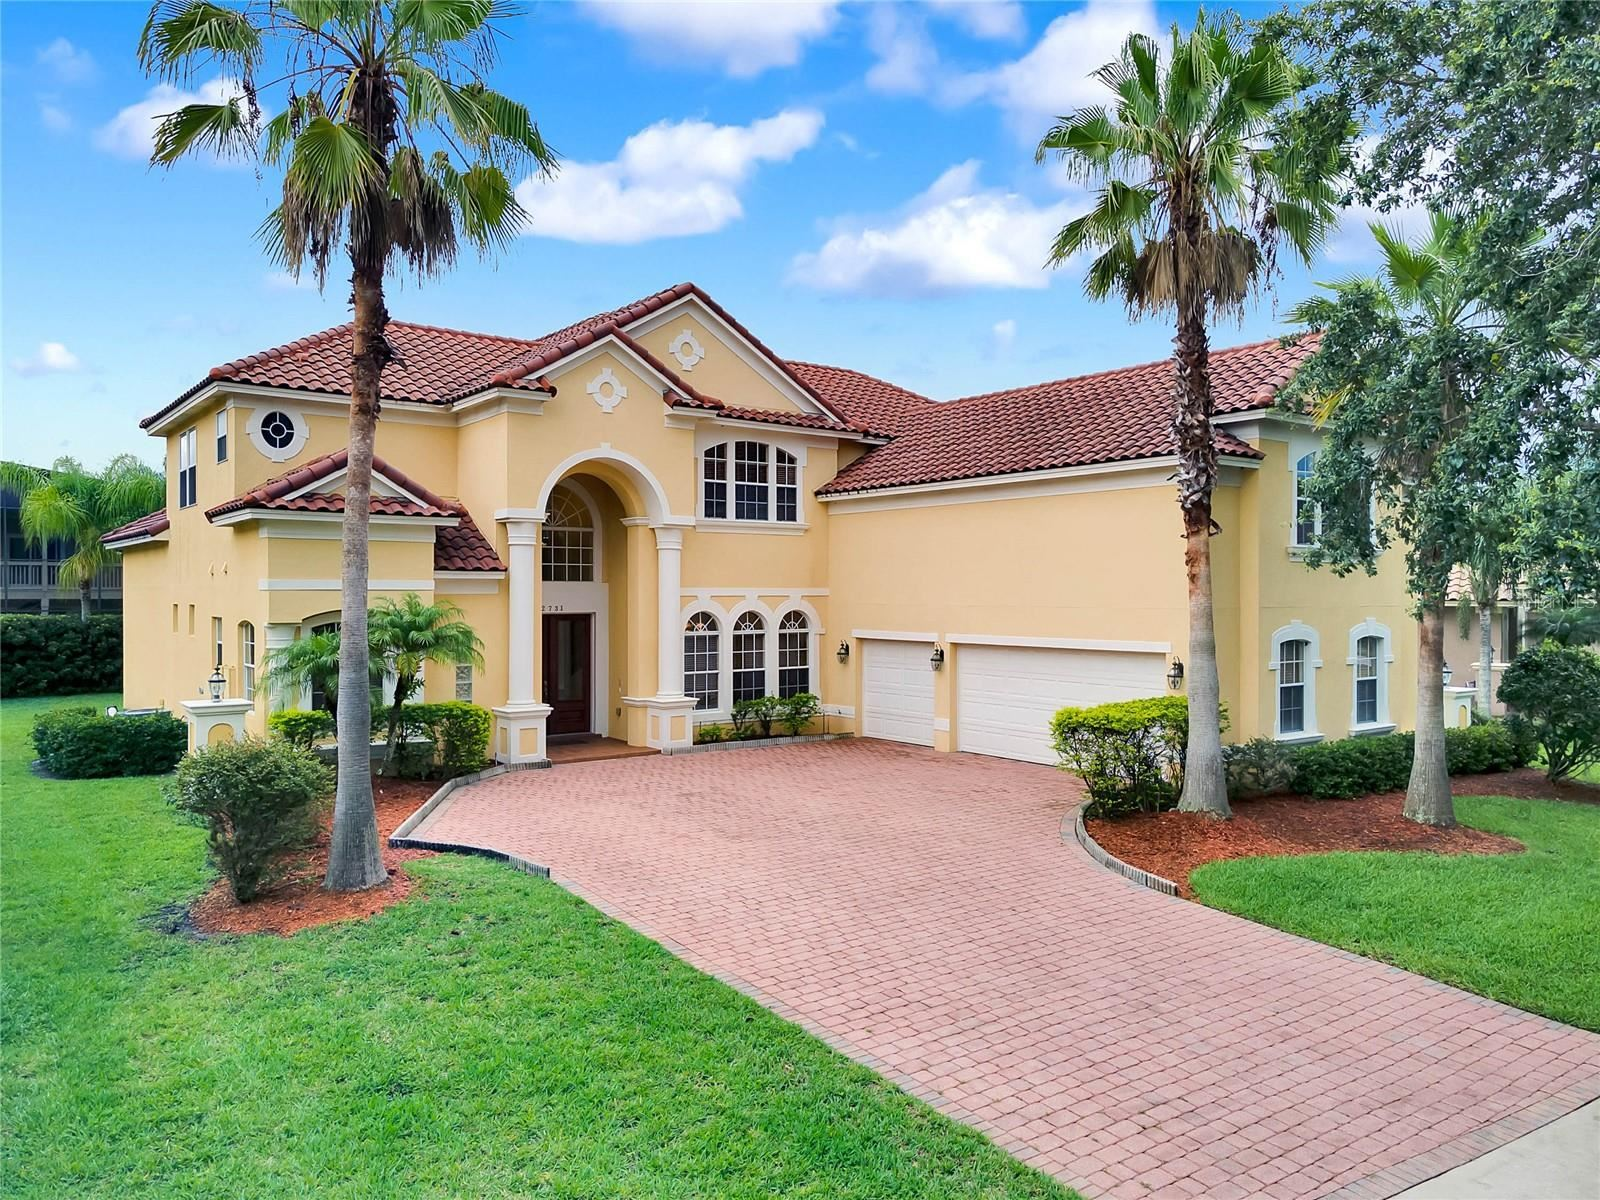 2731 NORTHAMPTON AVENUE, Orlando, FL 32828 - #: O5955611